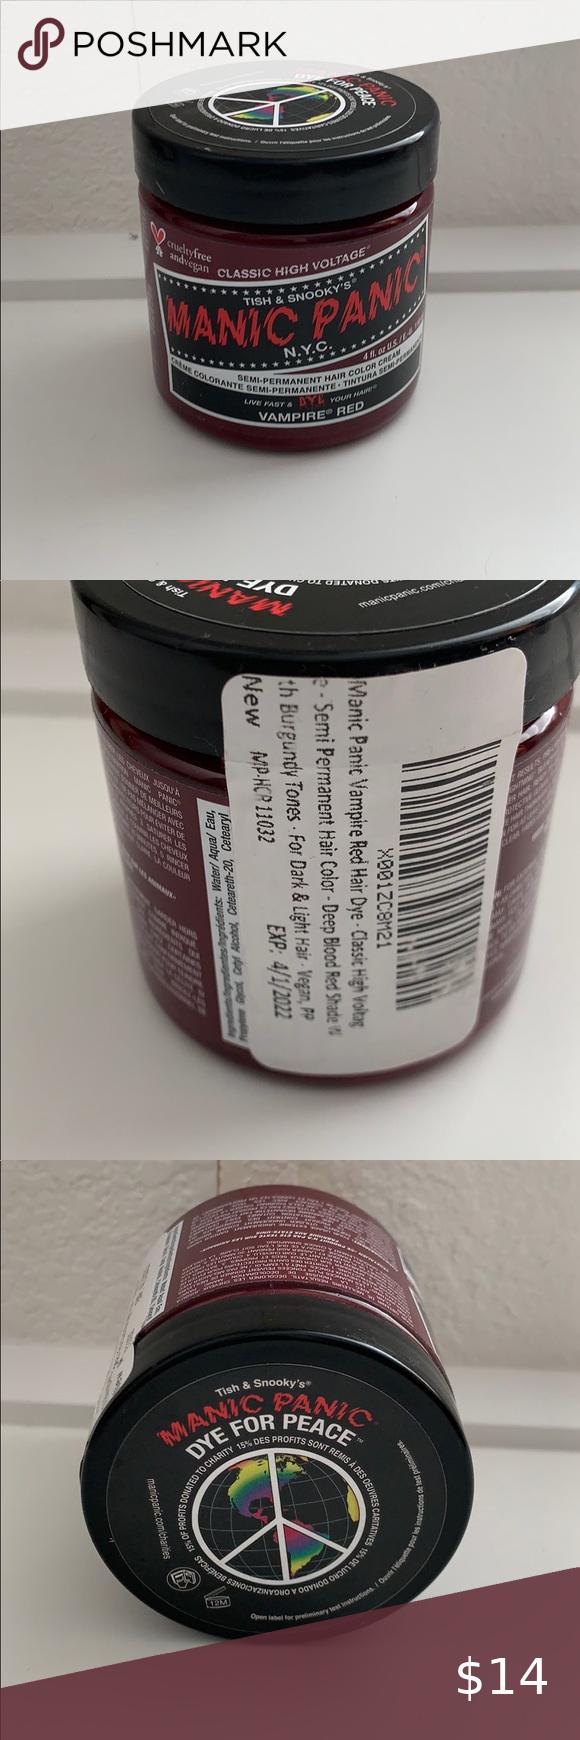 Manic Panic Semi Permanent Hair Dye In Vampire Red In 2020 Dyed Hair Semi Permanent Hair Dye Permanent Hair Dye